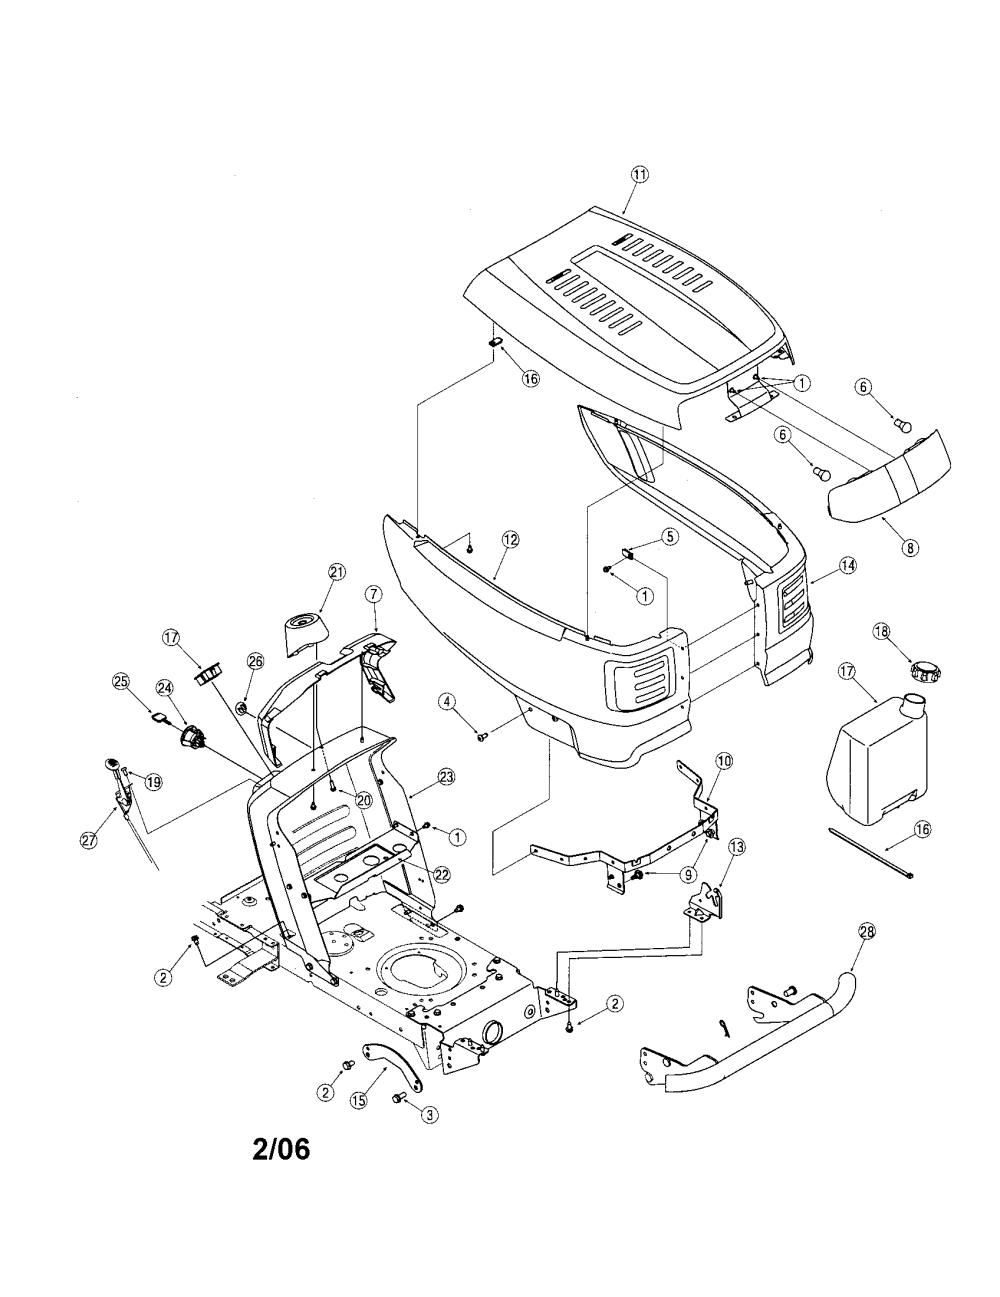 medium resolution of troy bilt pony solenoid wiring diagram imageresizertool com riding lawn mowers troy bilt 42 riding mower